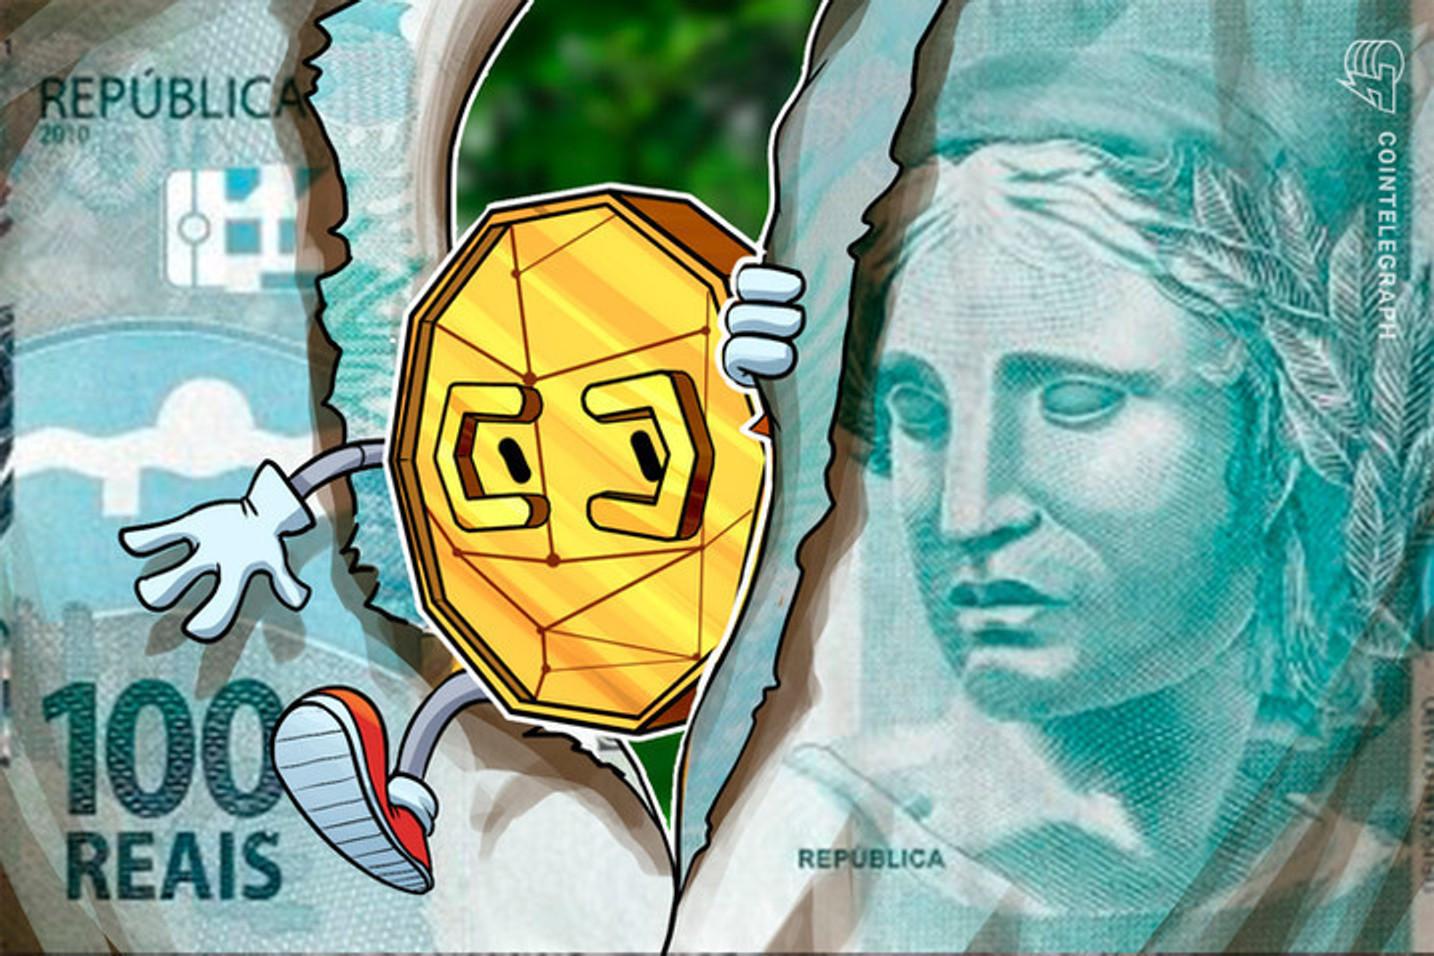 Mercado Bitcoin quer criptomoedas sendo usadas por todo os brasileiros e pede aprovação no Banco Central